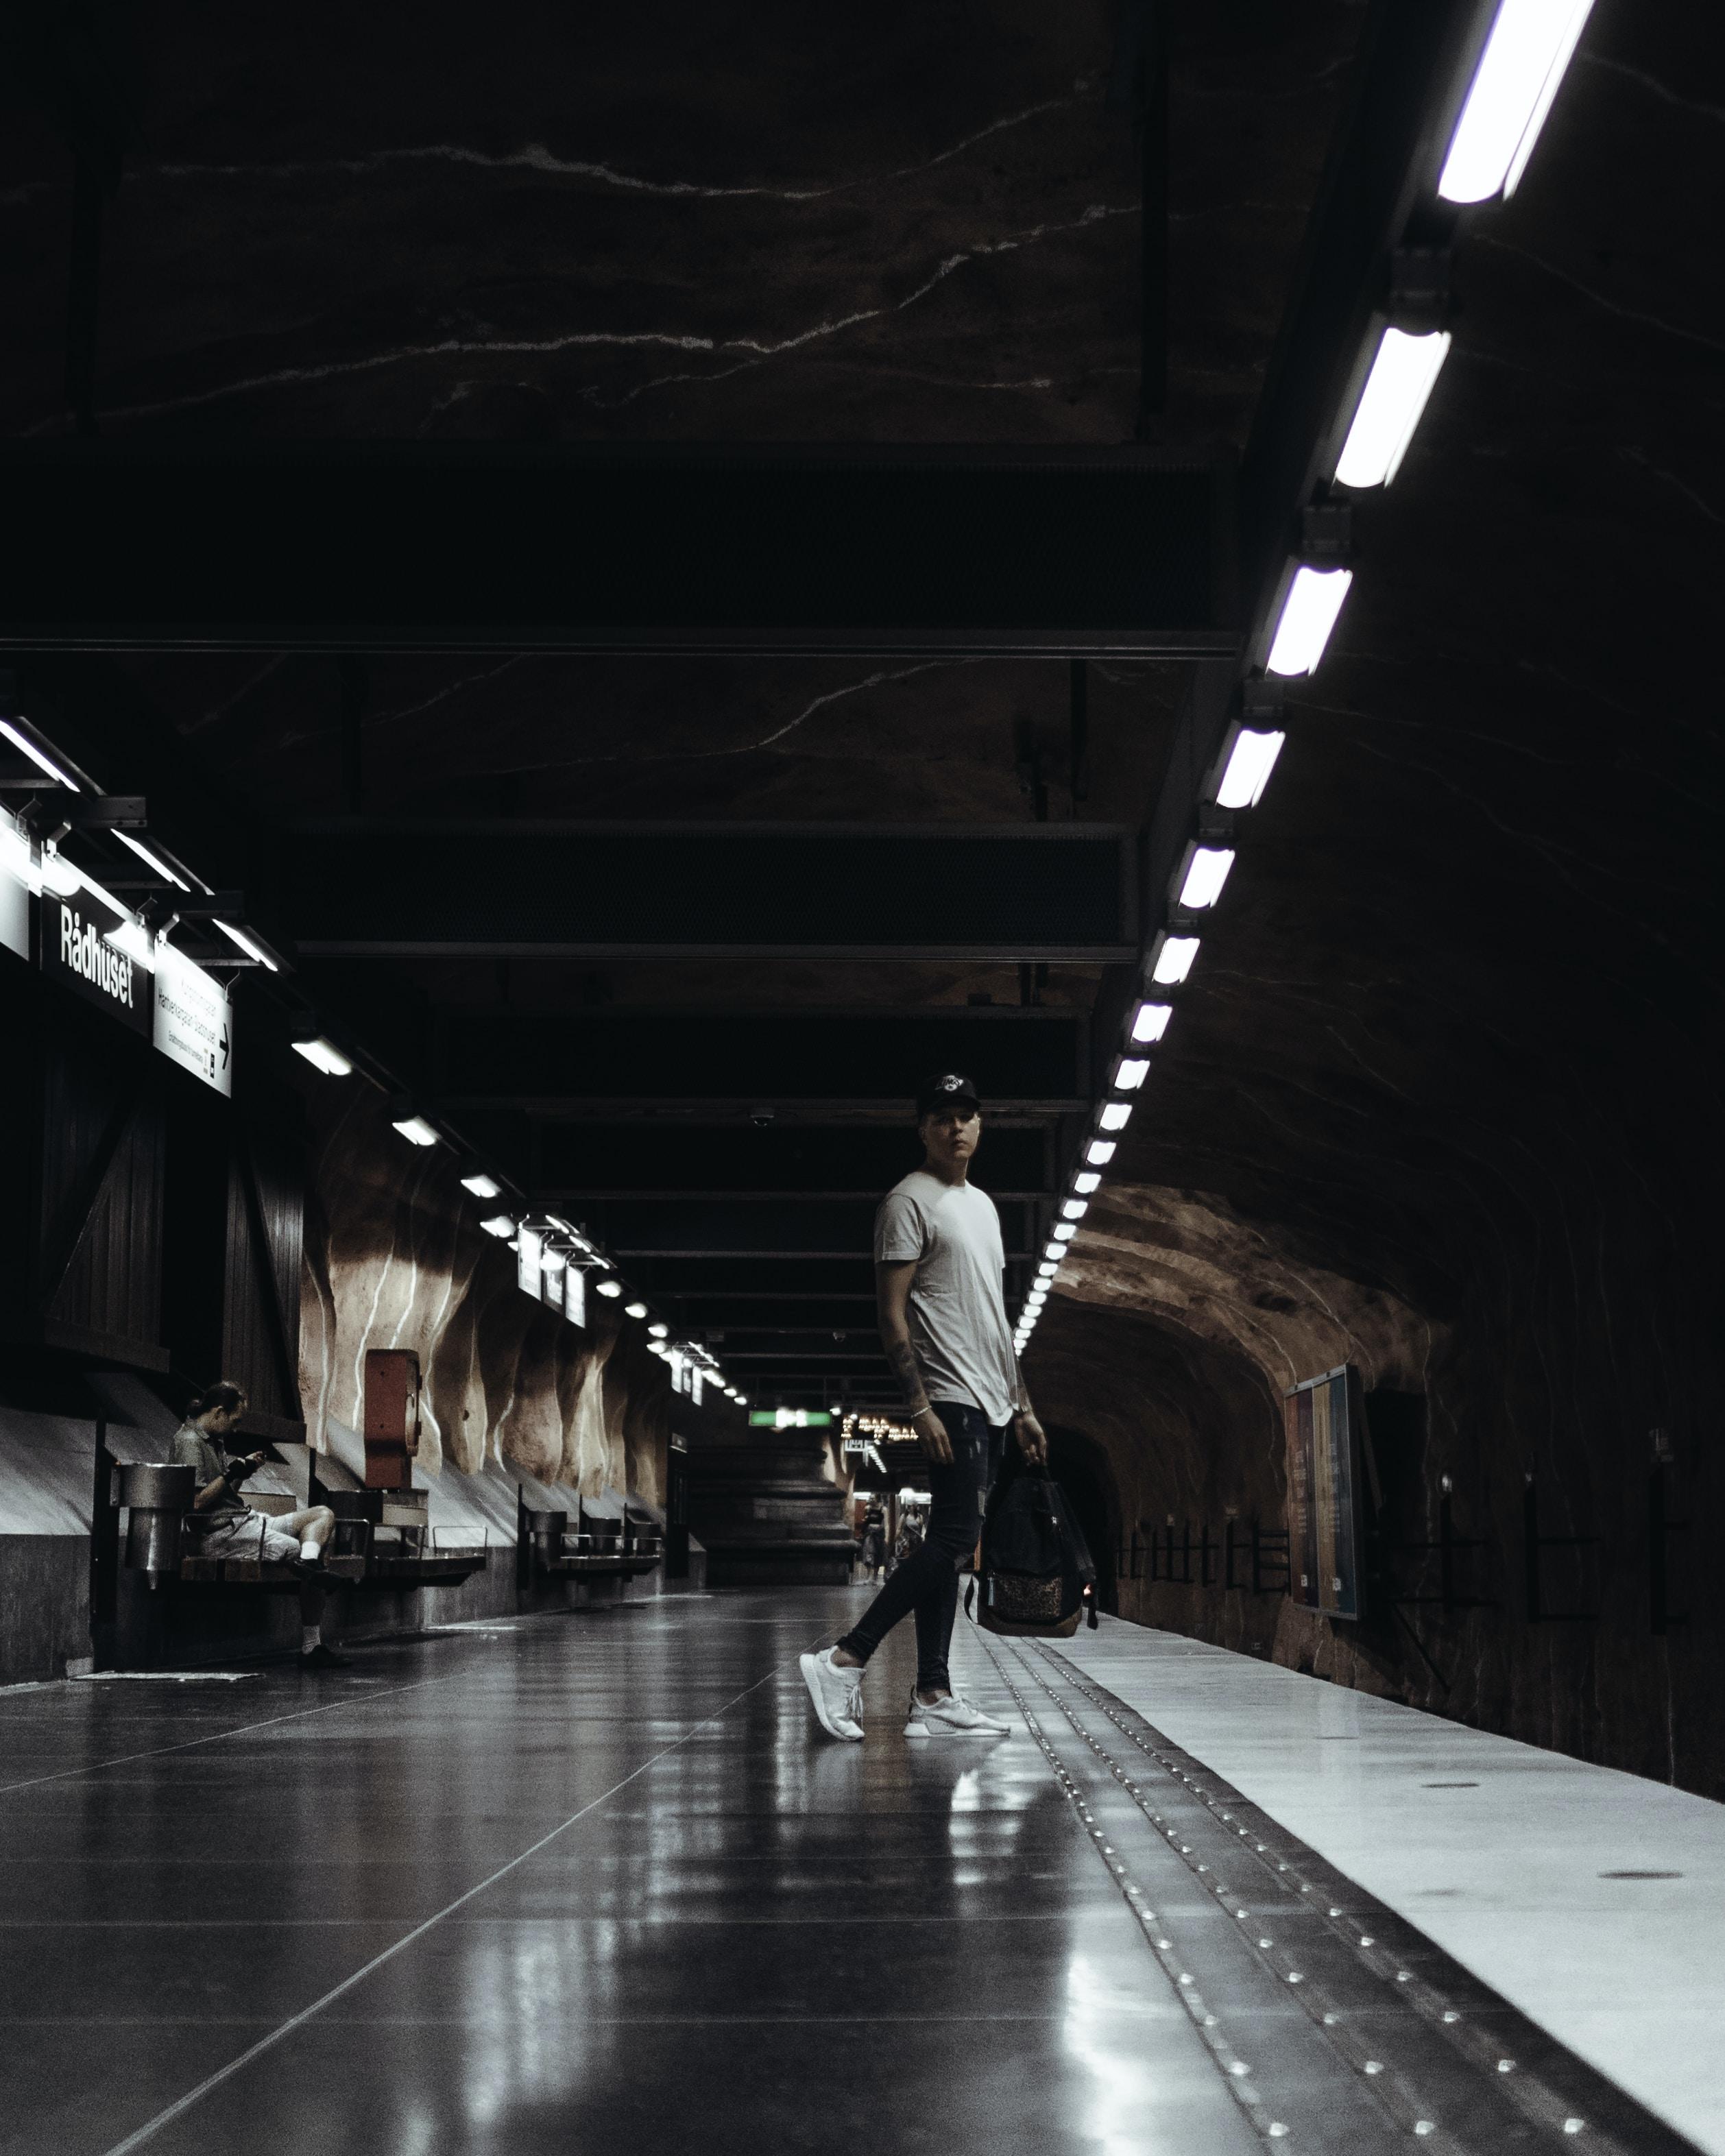 man standing on subway